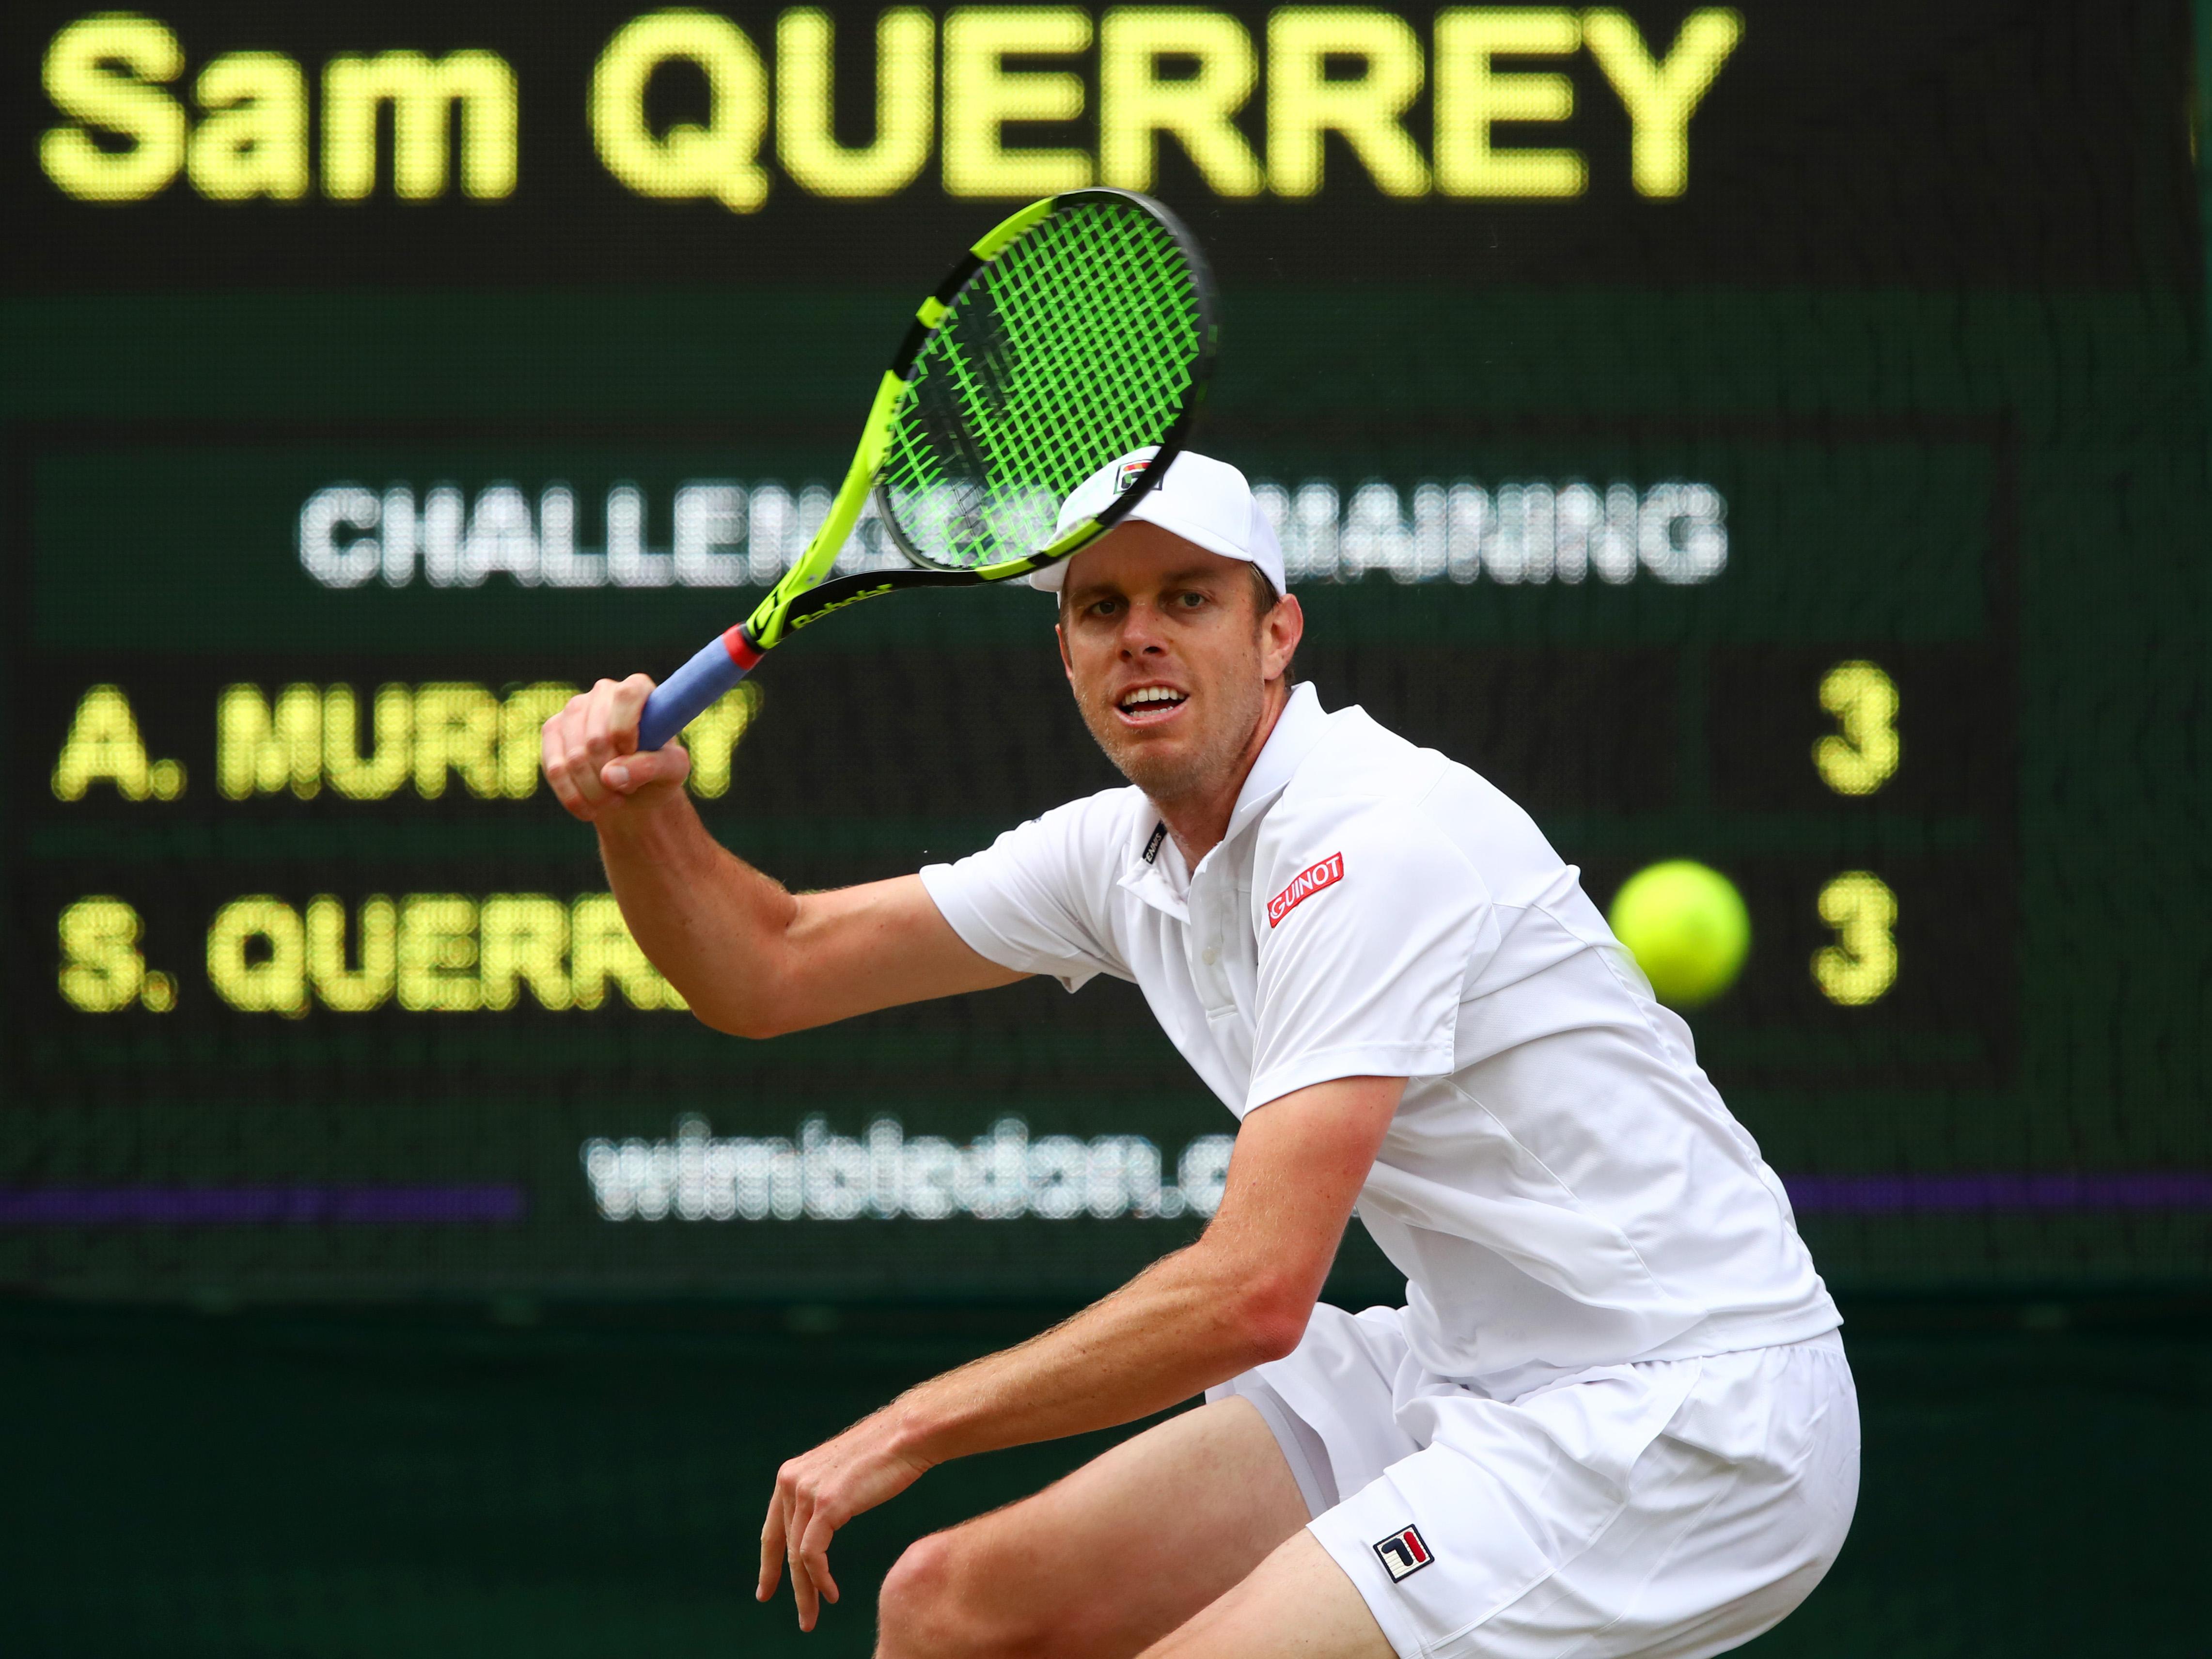 Day Nine: The Championships – Wimbledon 2017